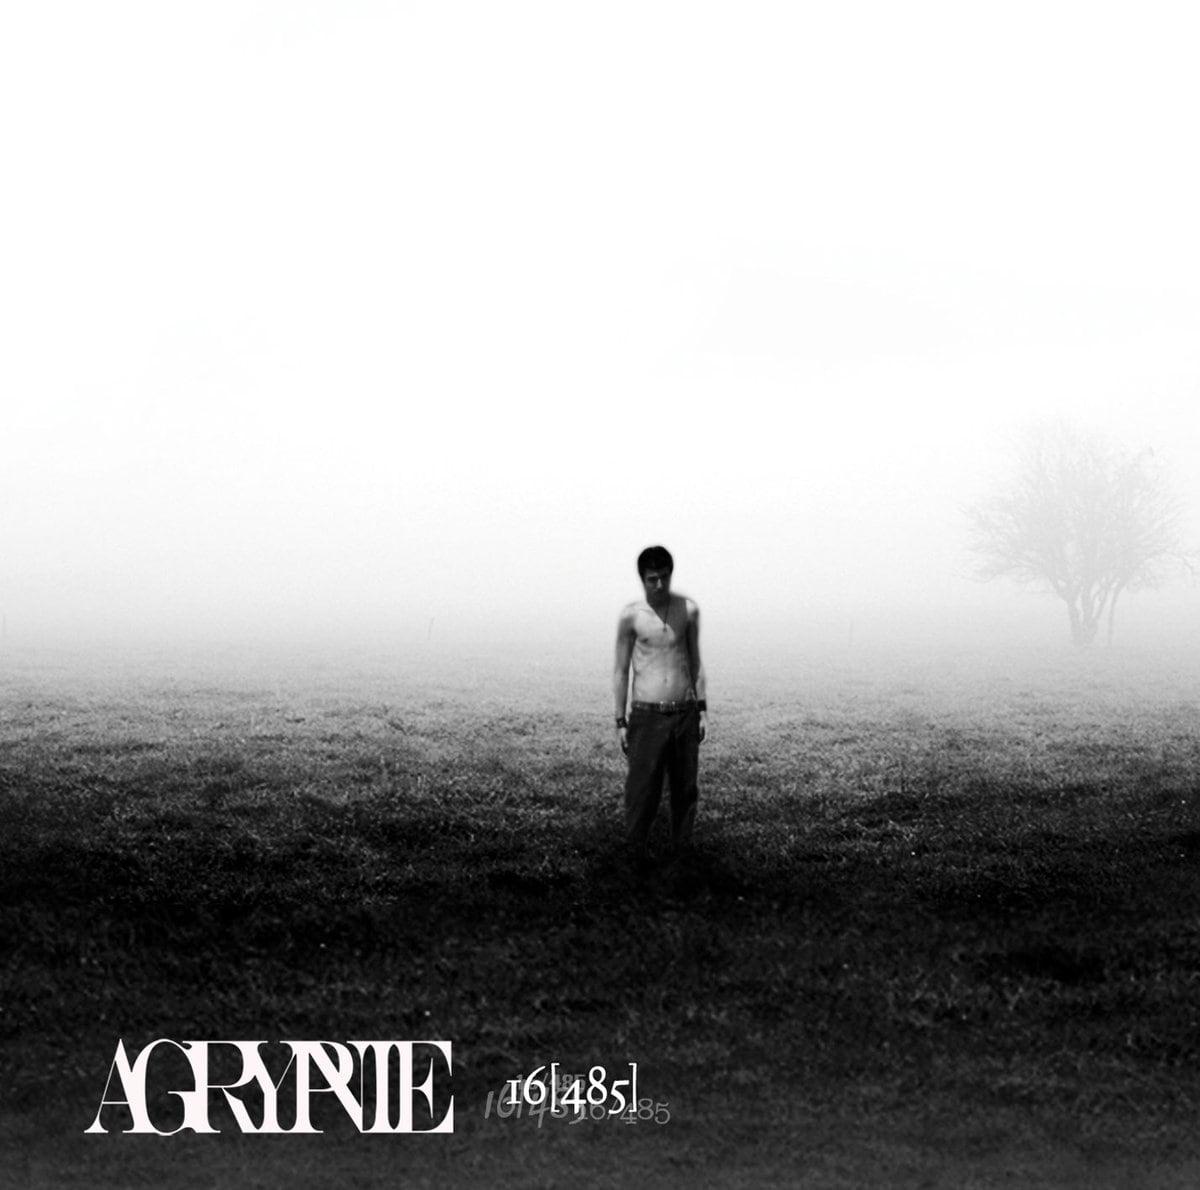 Agrypnie - 16[485]